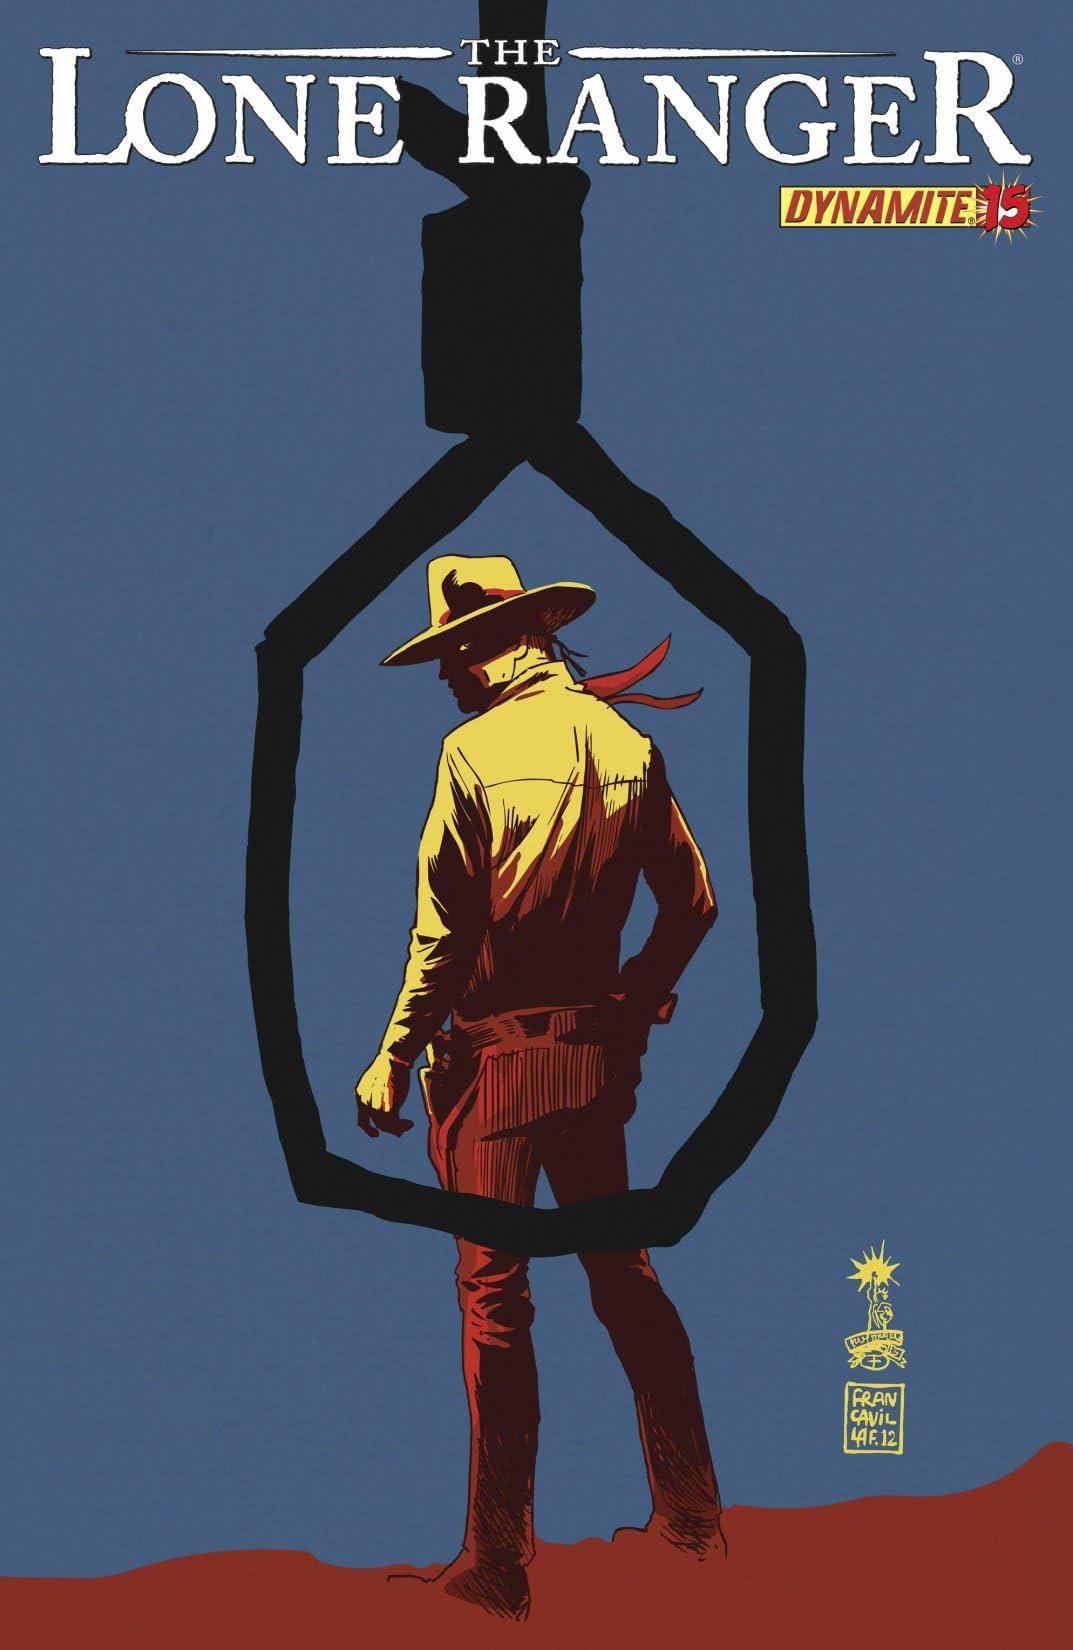 The Lone Ranger Vol. 2 #15